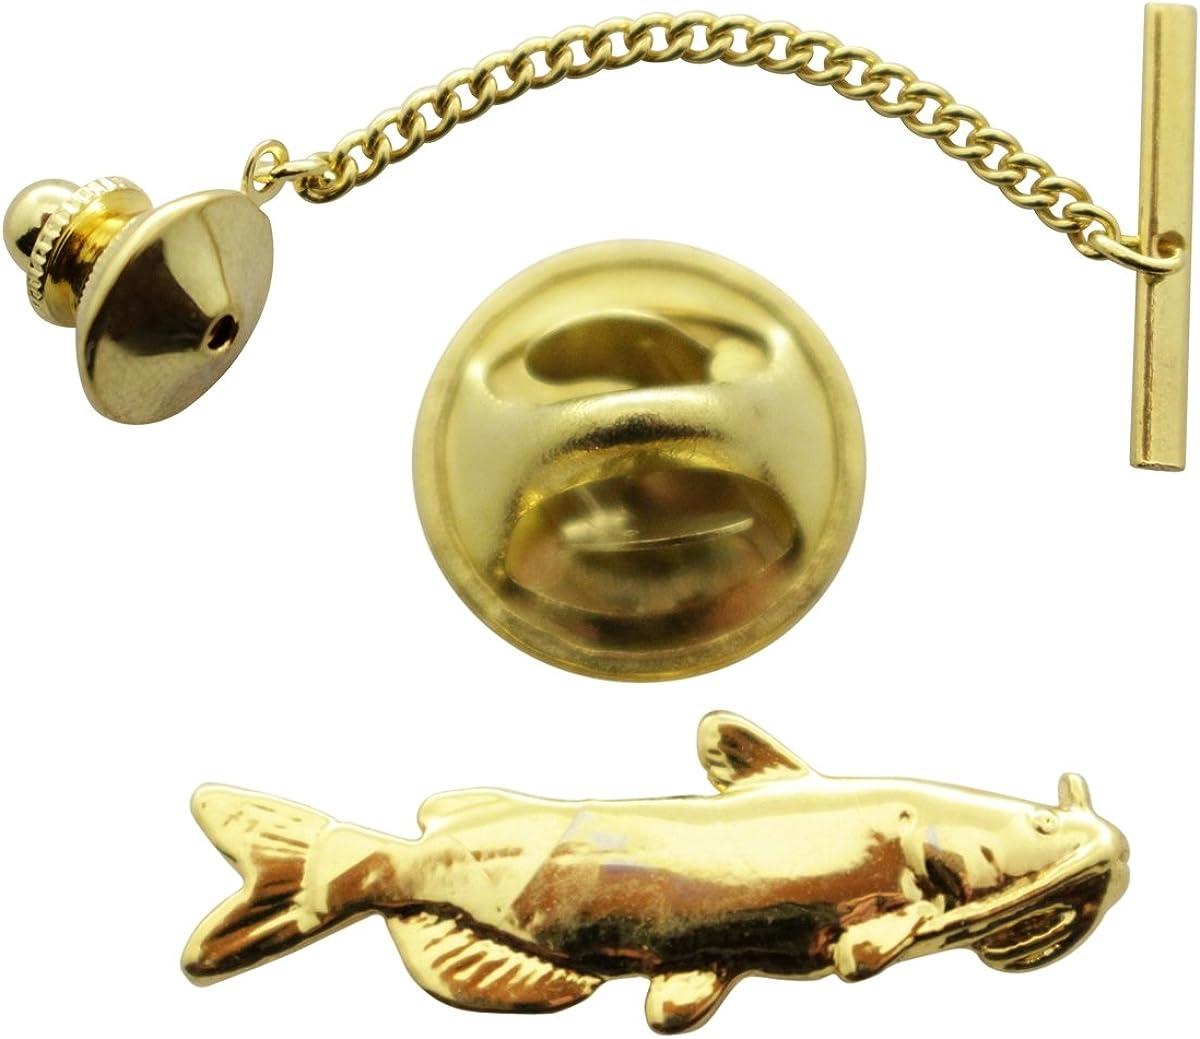 Sarah's Treats & Treasures Catfish Tie Tack ~ 24K Gold ~ Tie Tack or Pin